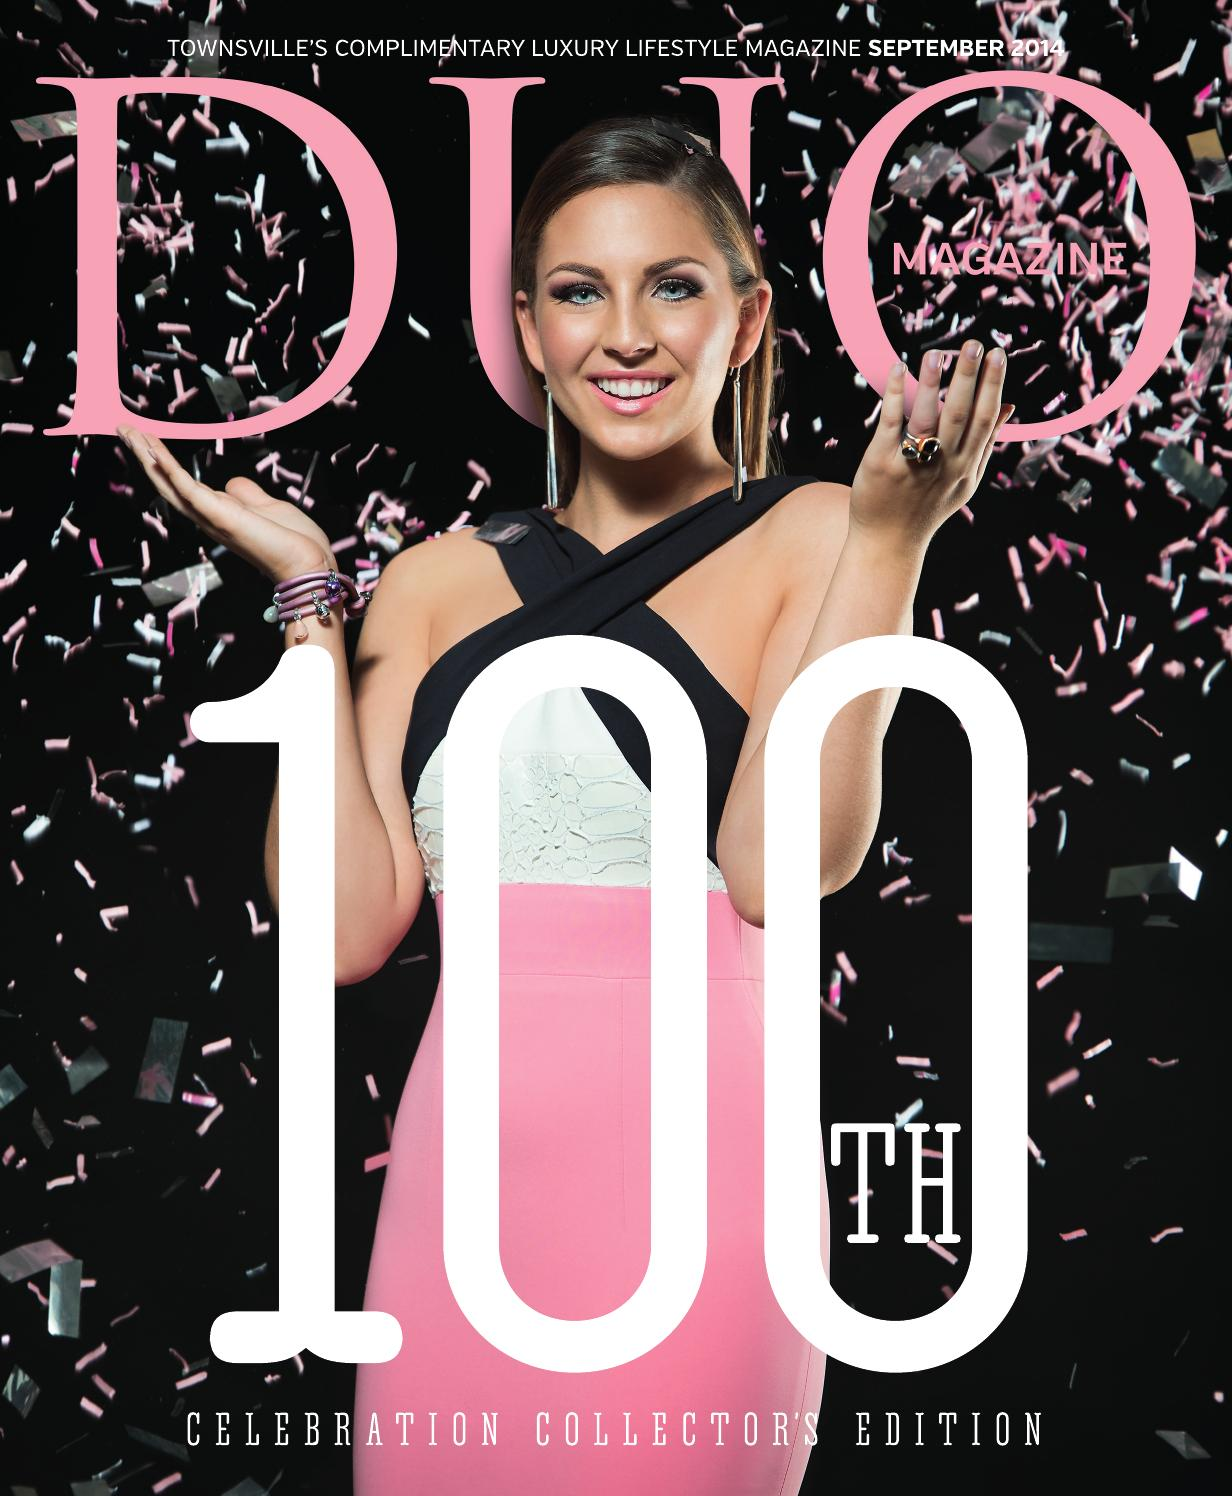 258cb15a006 DUO Magazine September 2014 by DUO Magazine - issuu